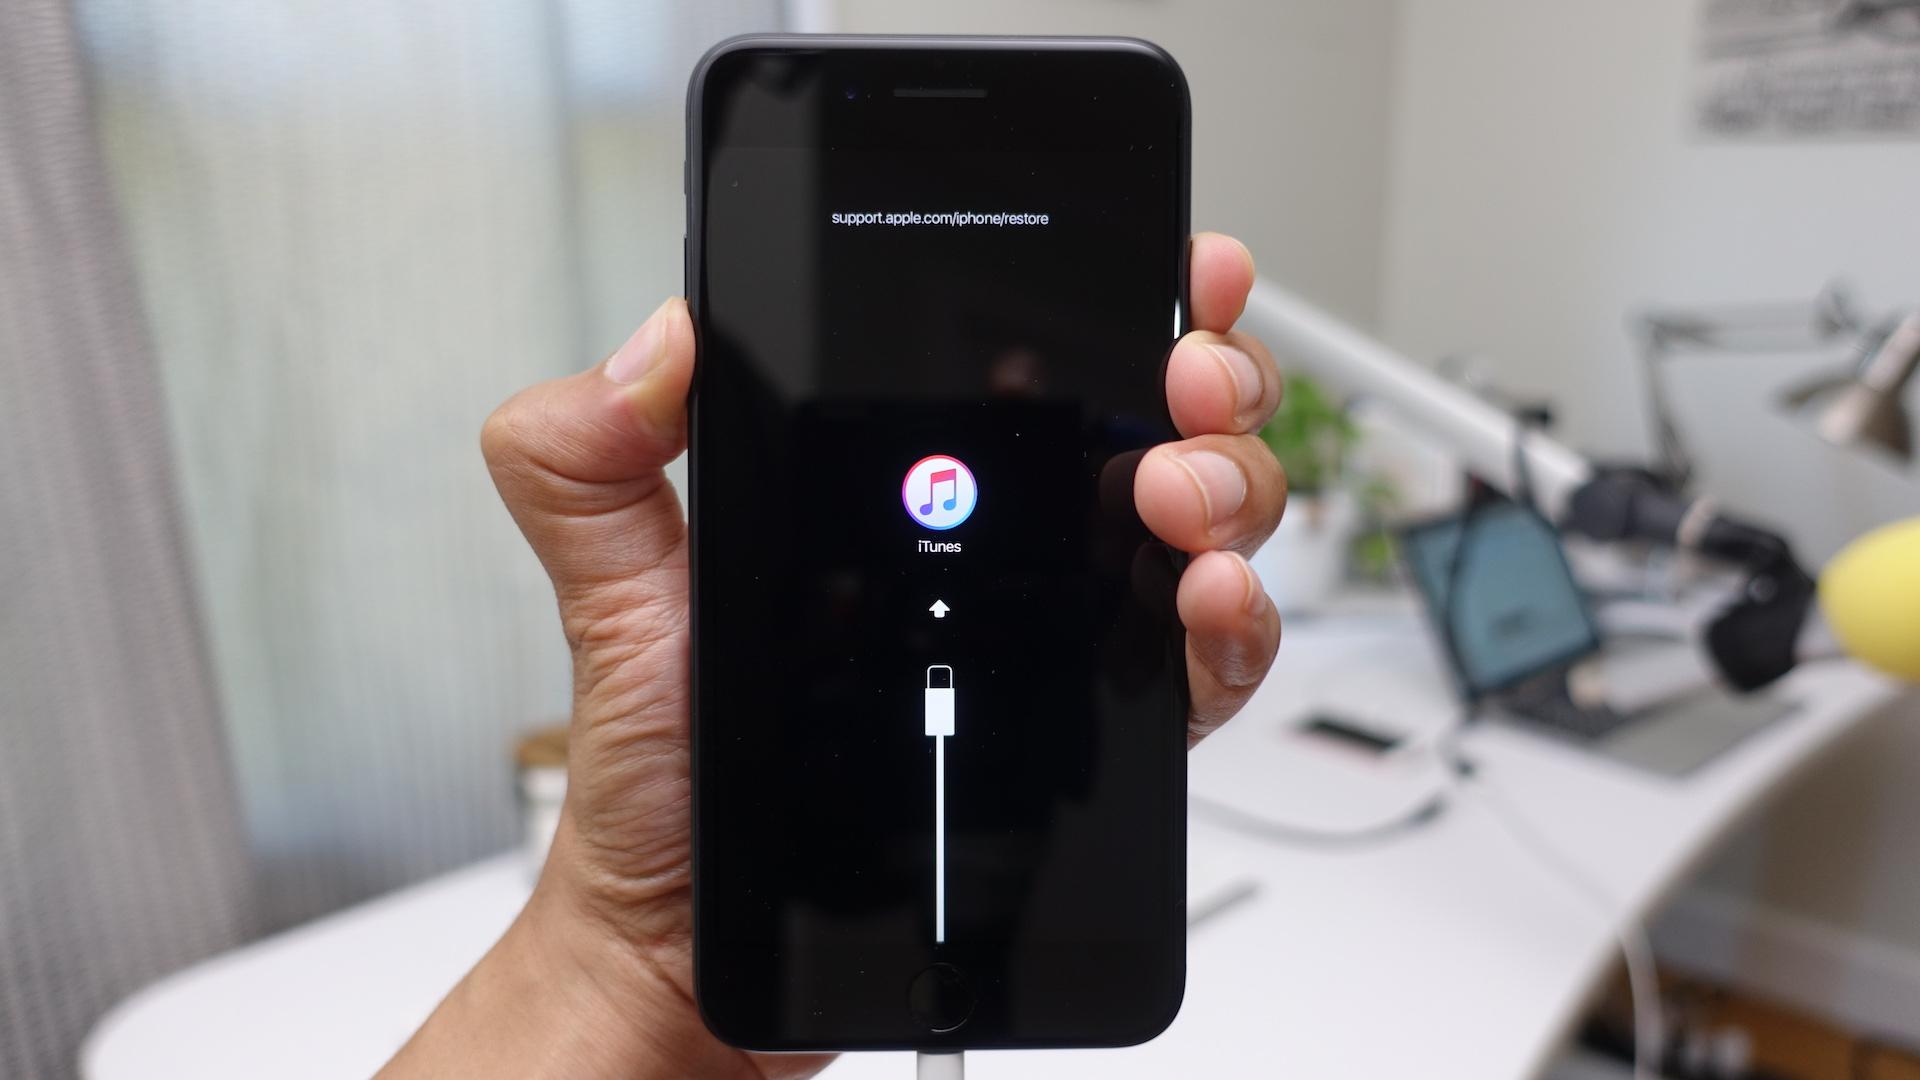 How to reset my iphone 6 forgot passcode